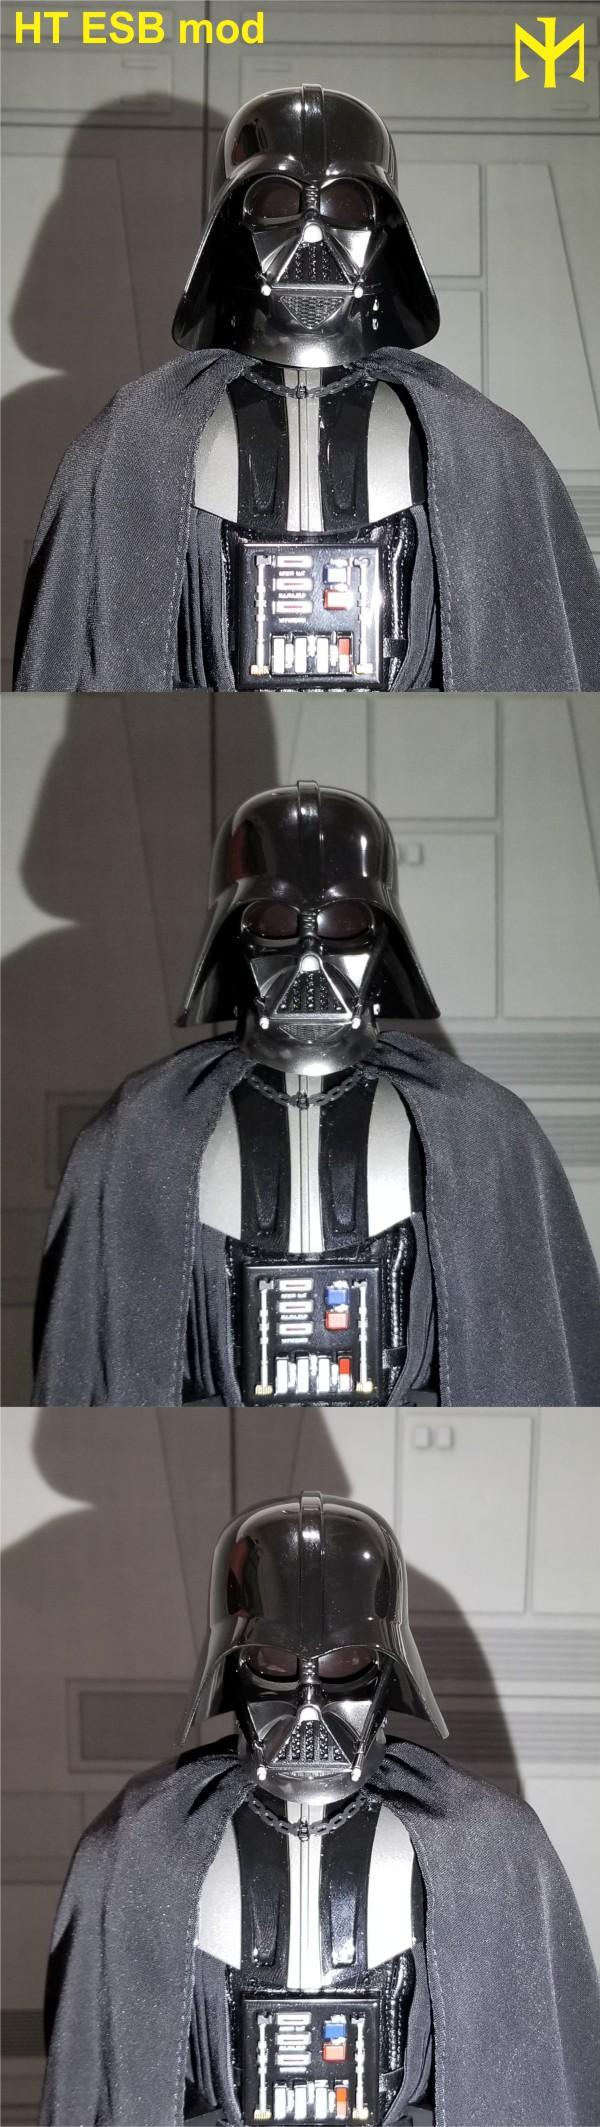 STAR WARS New customizing Hot Toys ESB Vader head Htdves26